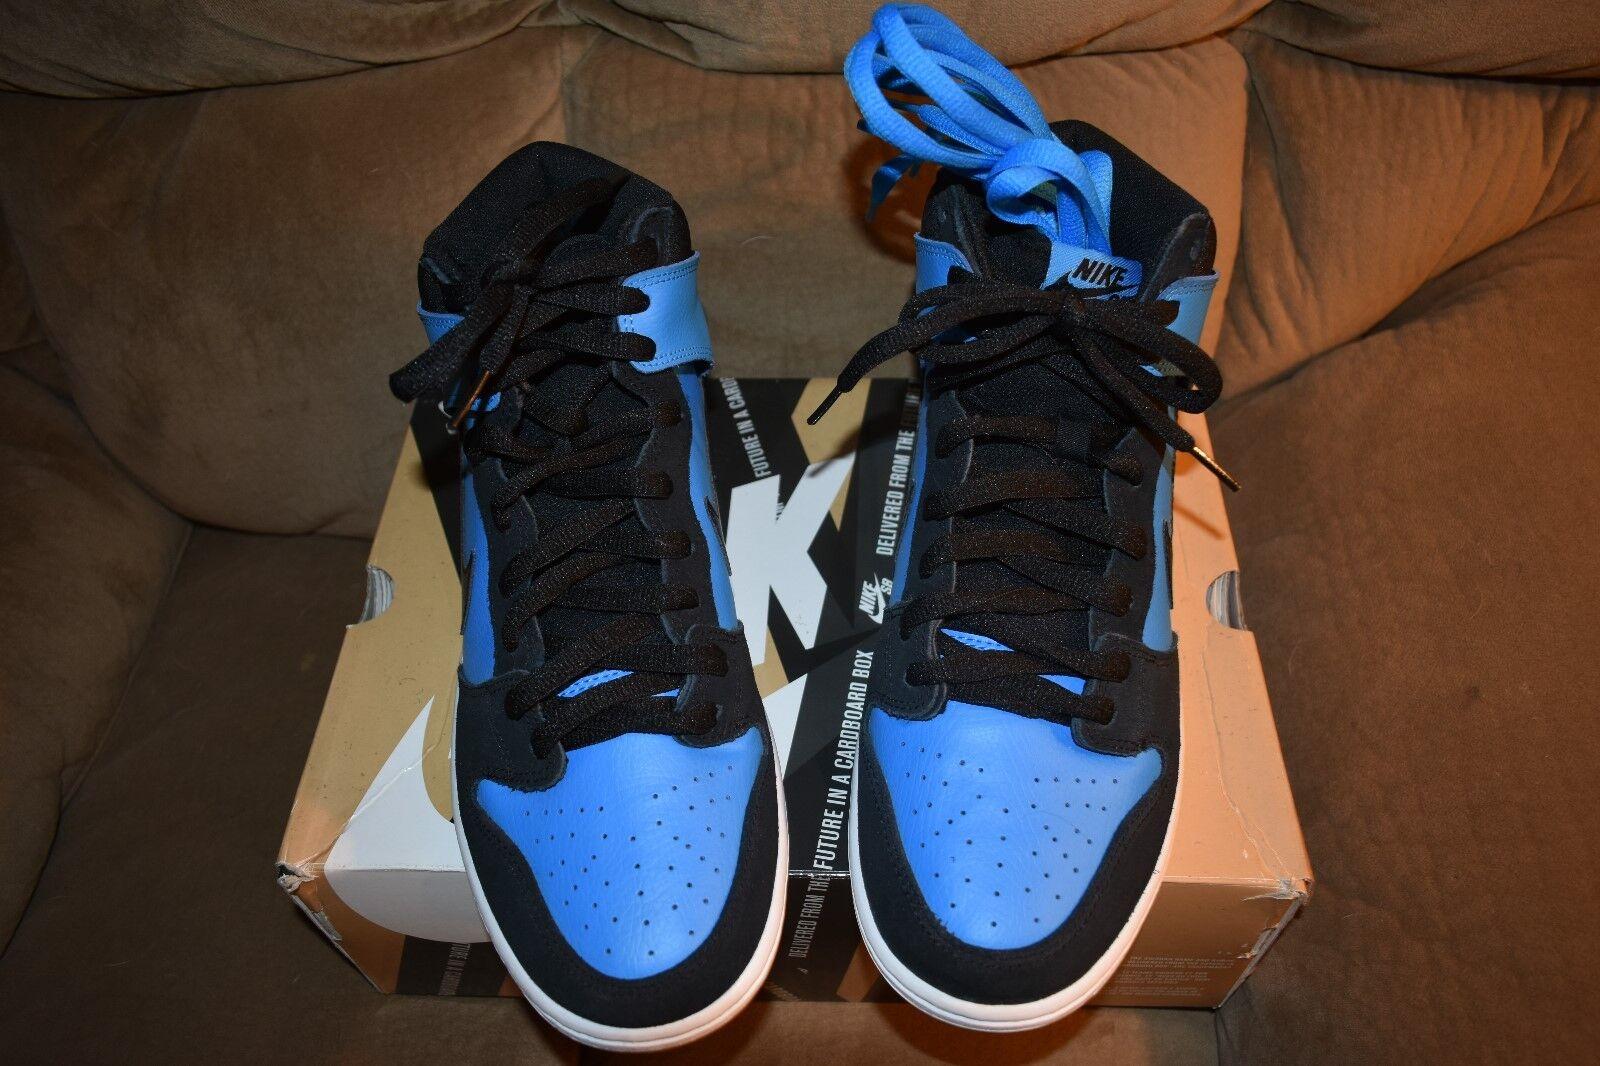 Nike DUNK HIGH PRO SB Blue Hero Black Gum Light Brn 305050-470 Men's 10.5